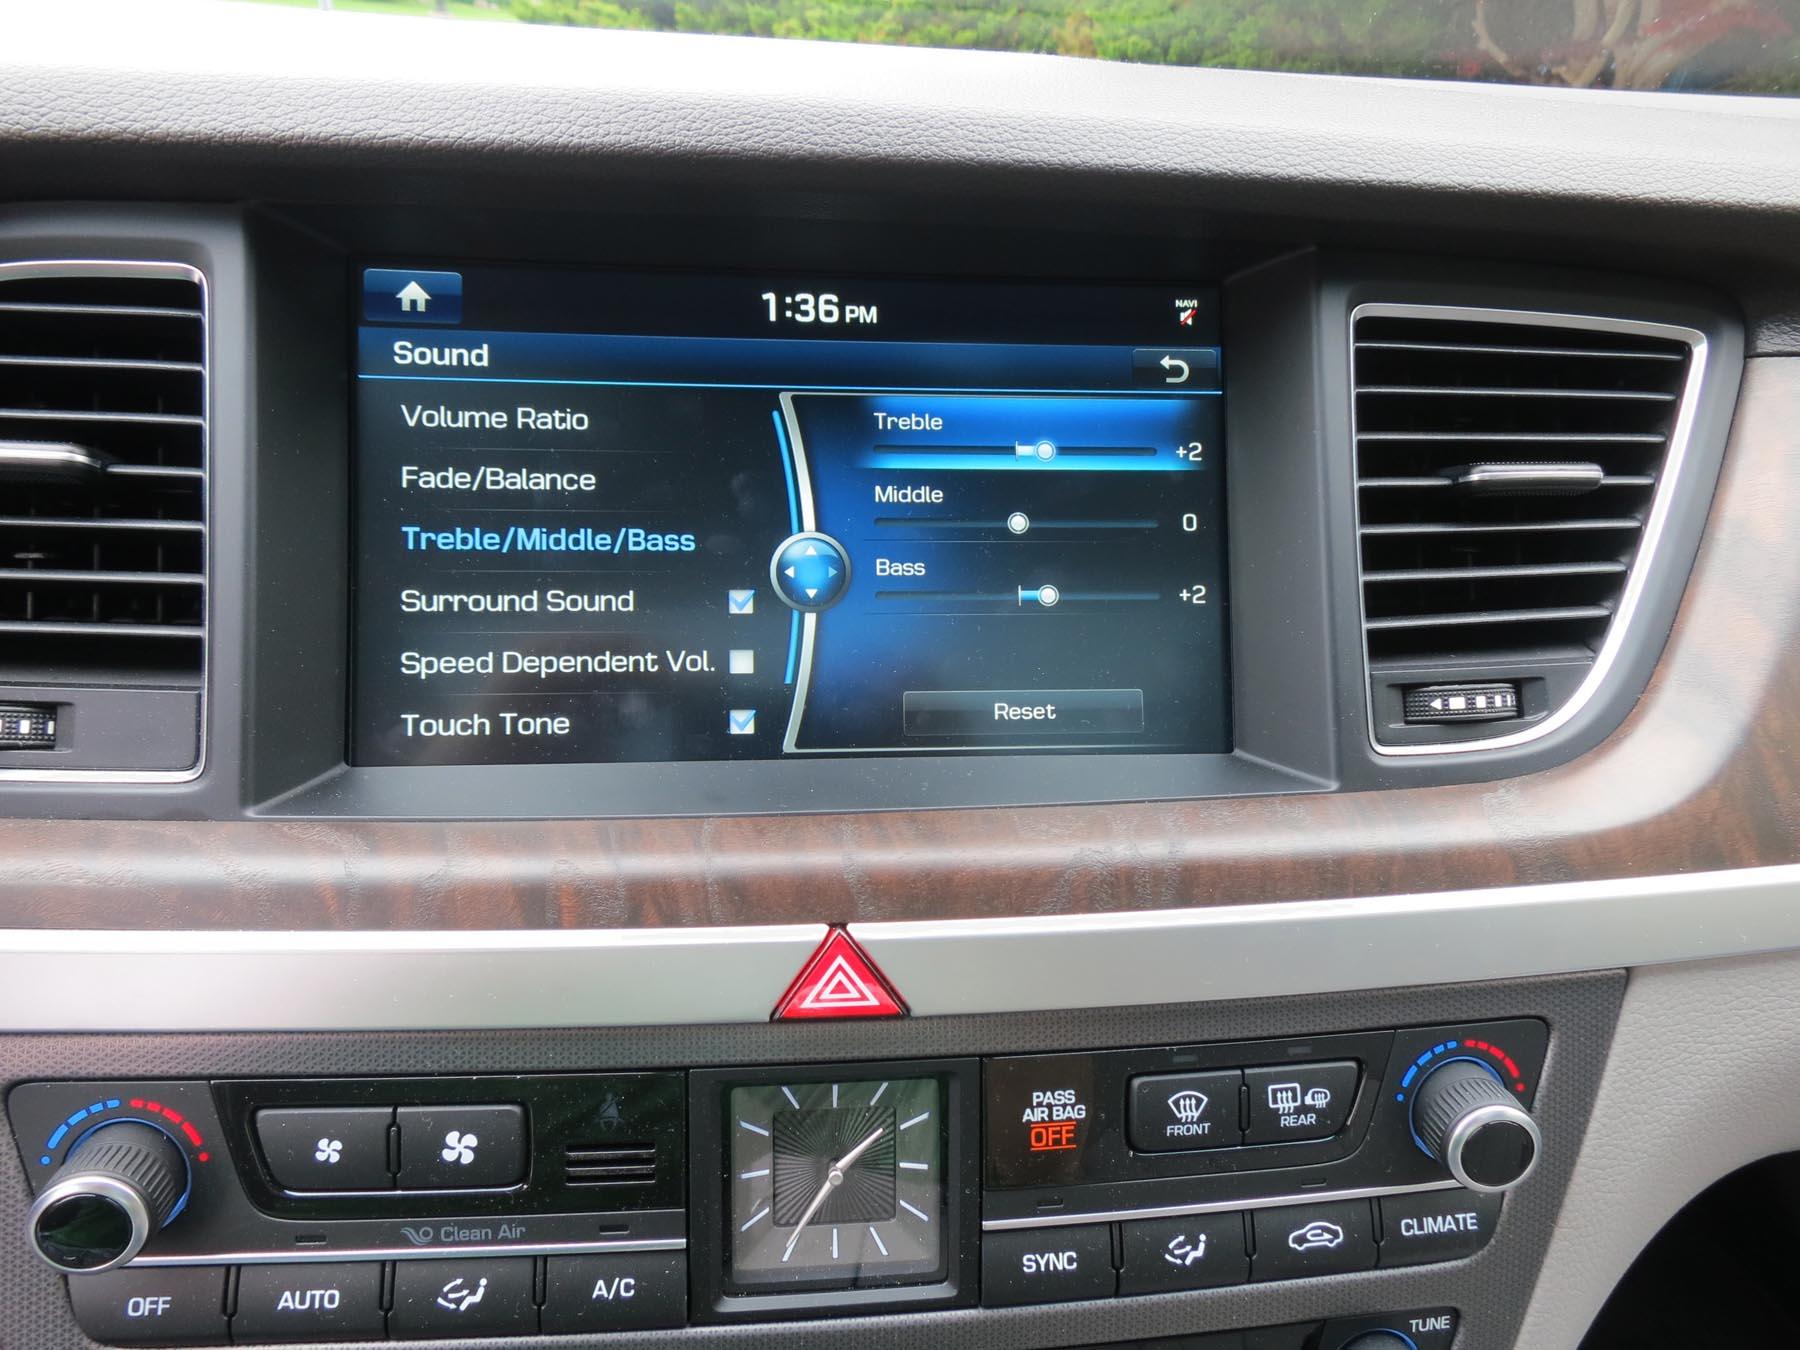 2015 Hyundai Genesis Lexicon audio